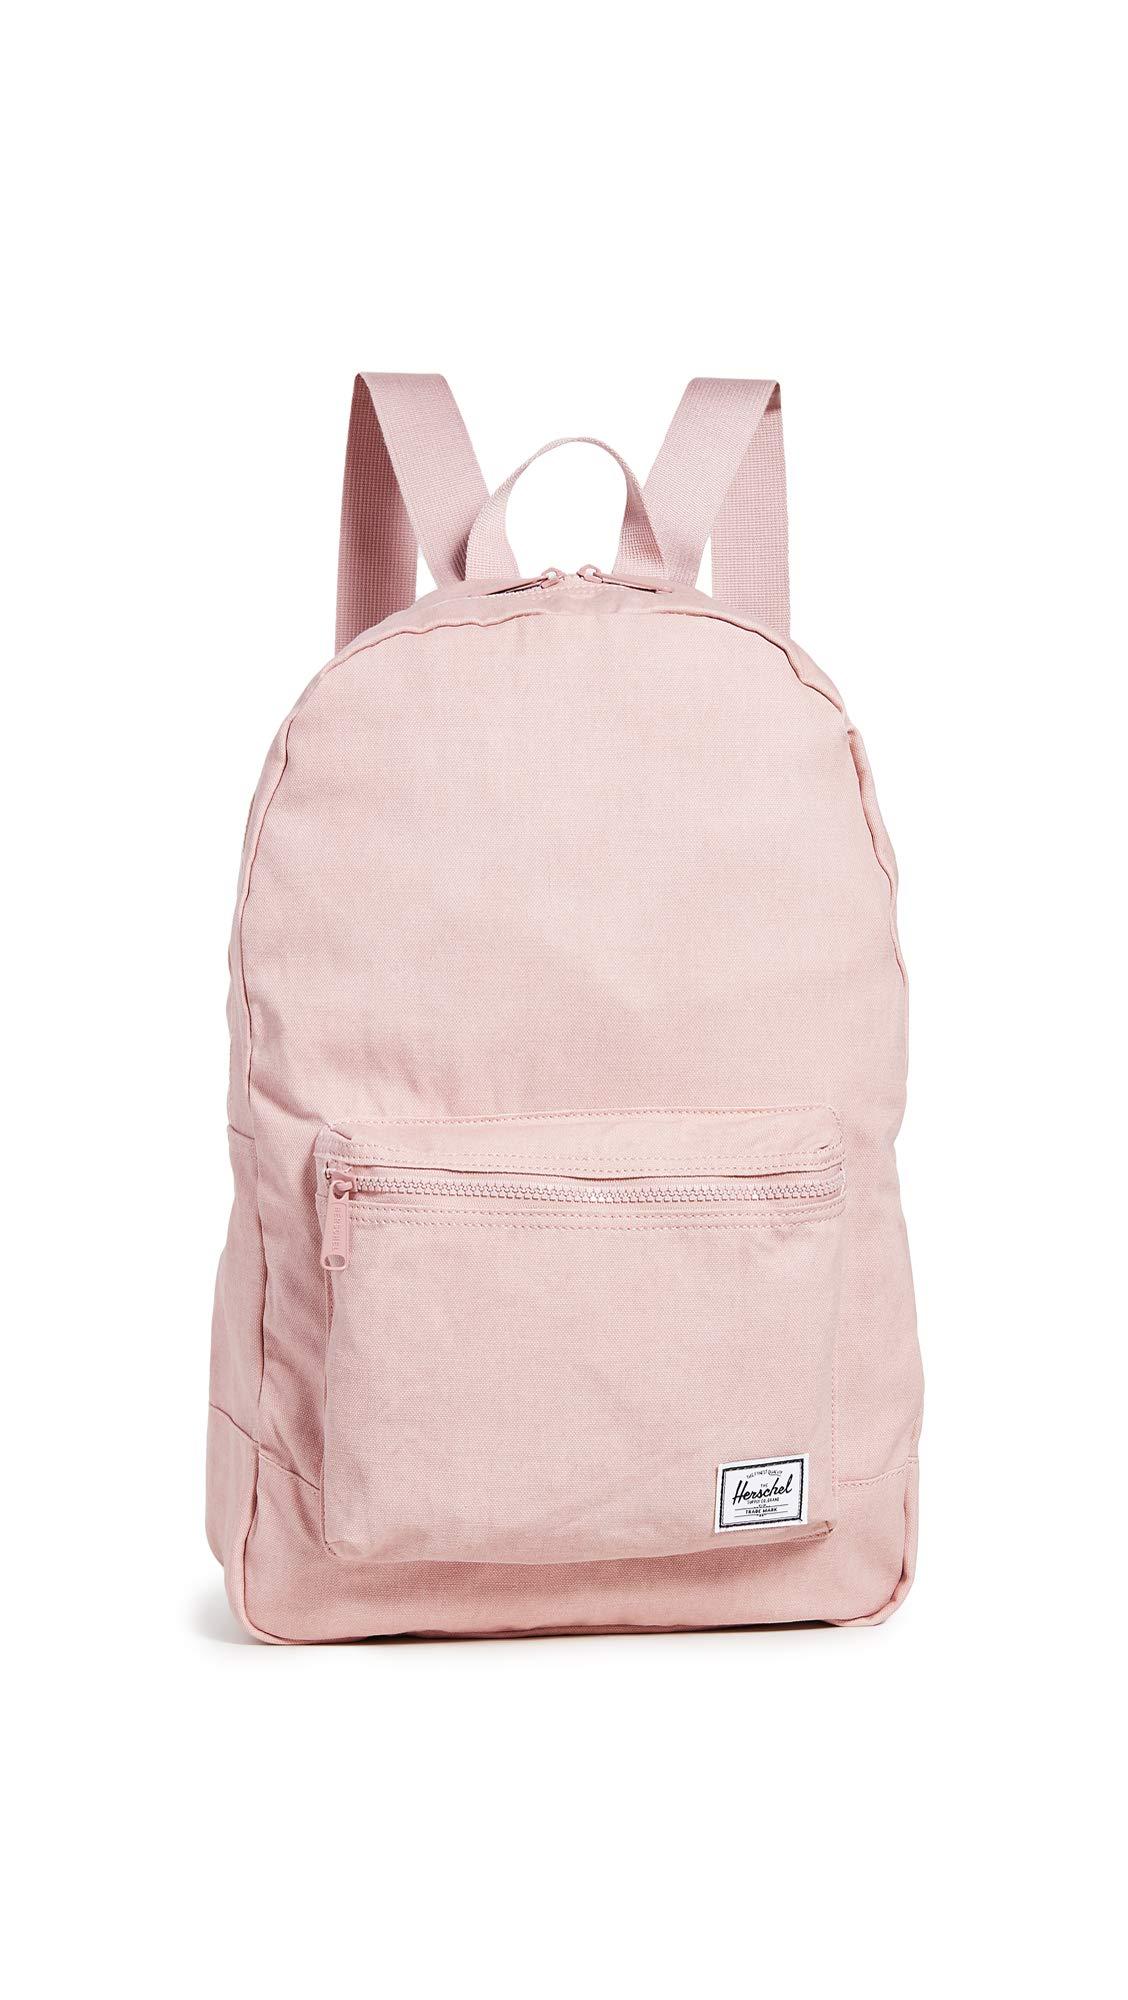 Herschel Supply Co. Women's Daypack Backpack, Pale Mauve, Pink, One Size by Herschel